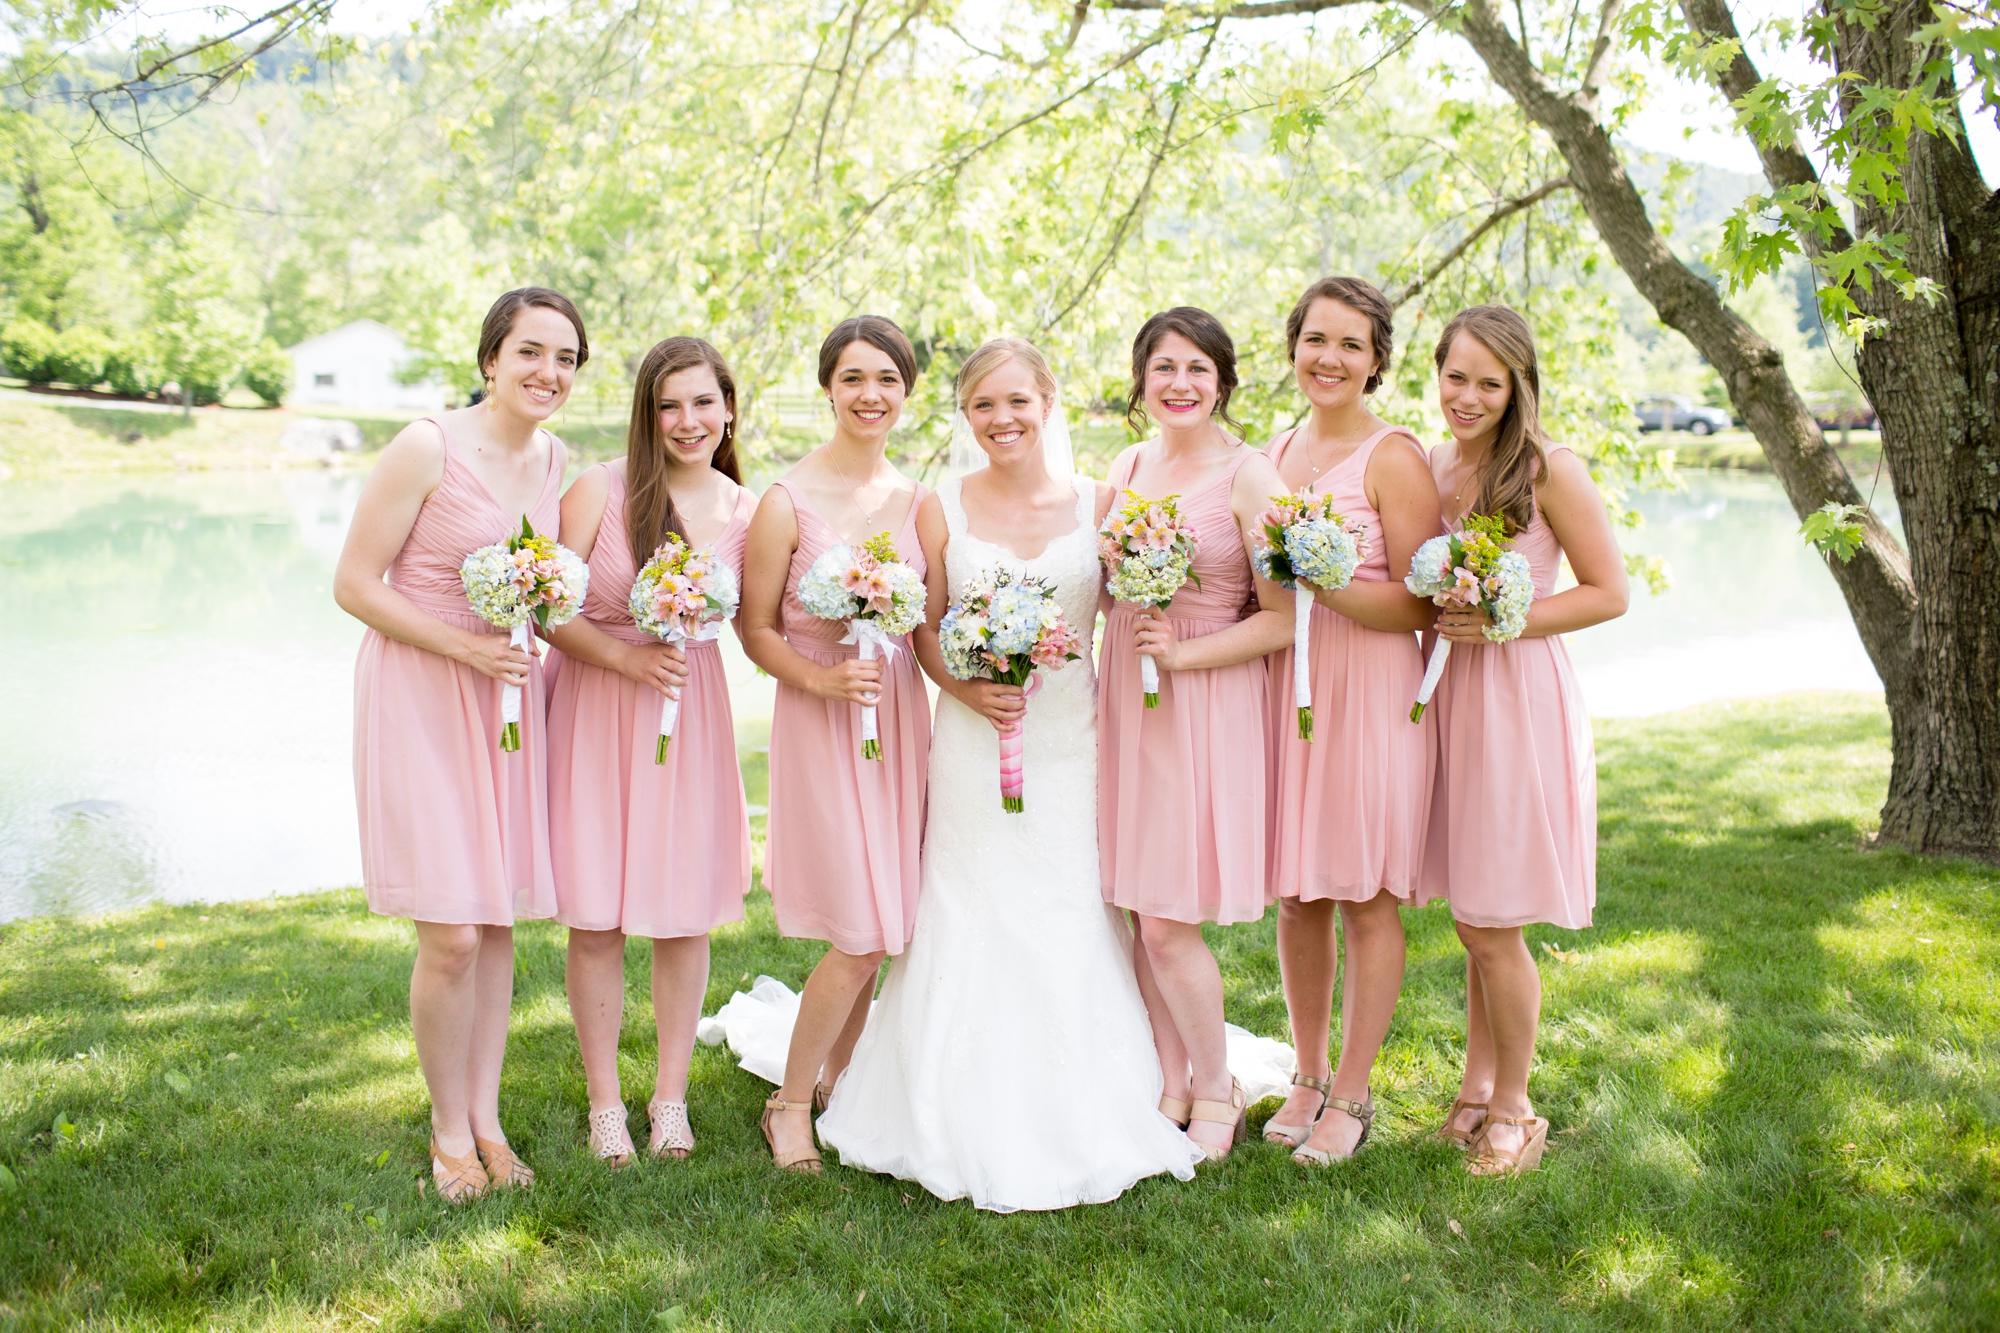 2-Rittler Wedding Bridal Party-196.jpg